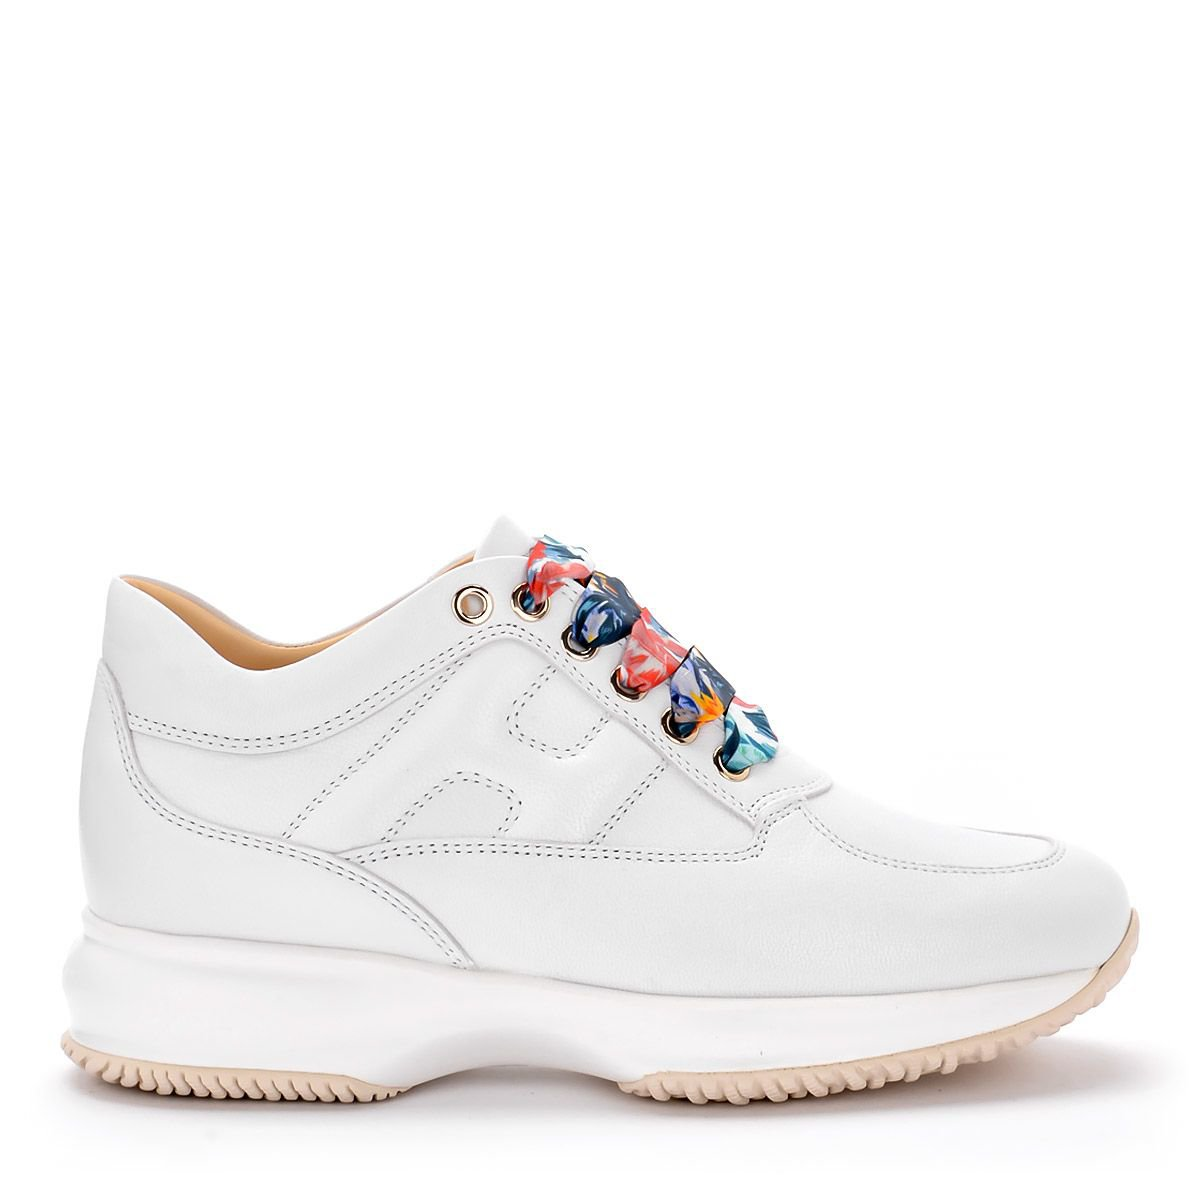 Hogan Interactive Luxury White Refined Leather Sneaker